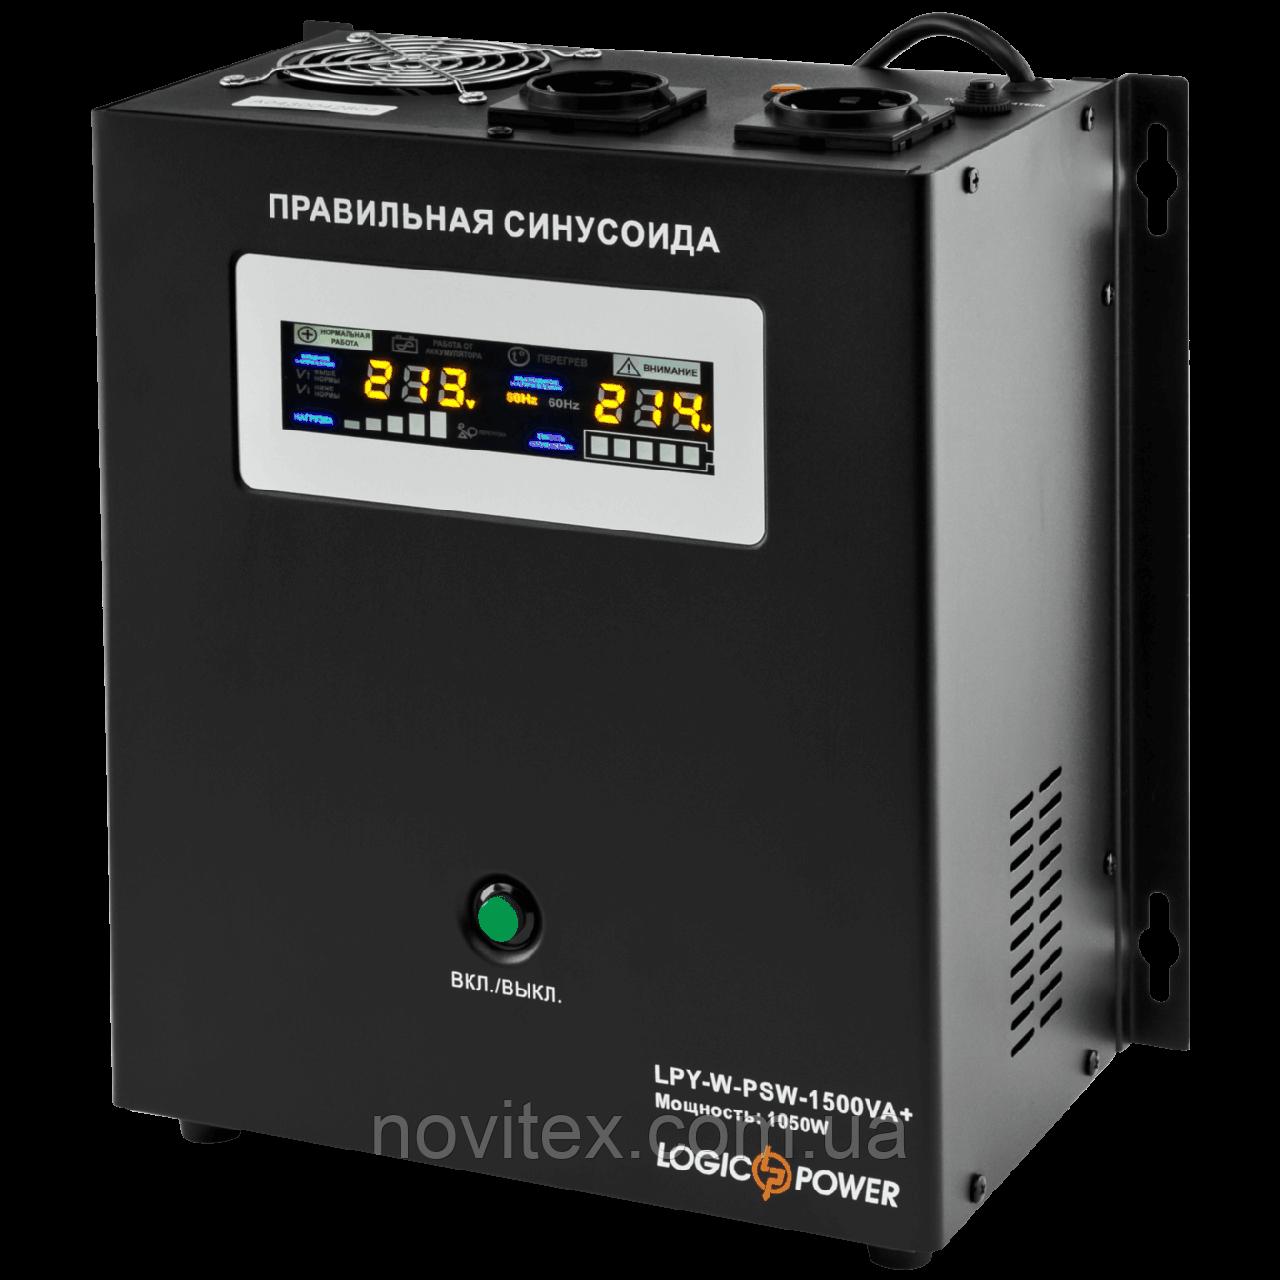 ИБП Logicpower LPY-W-PSW-1500+ (1050Вт) 24V